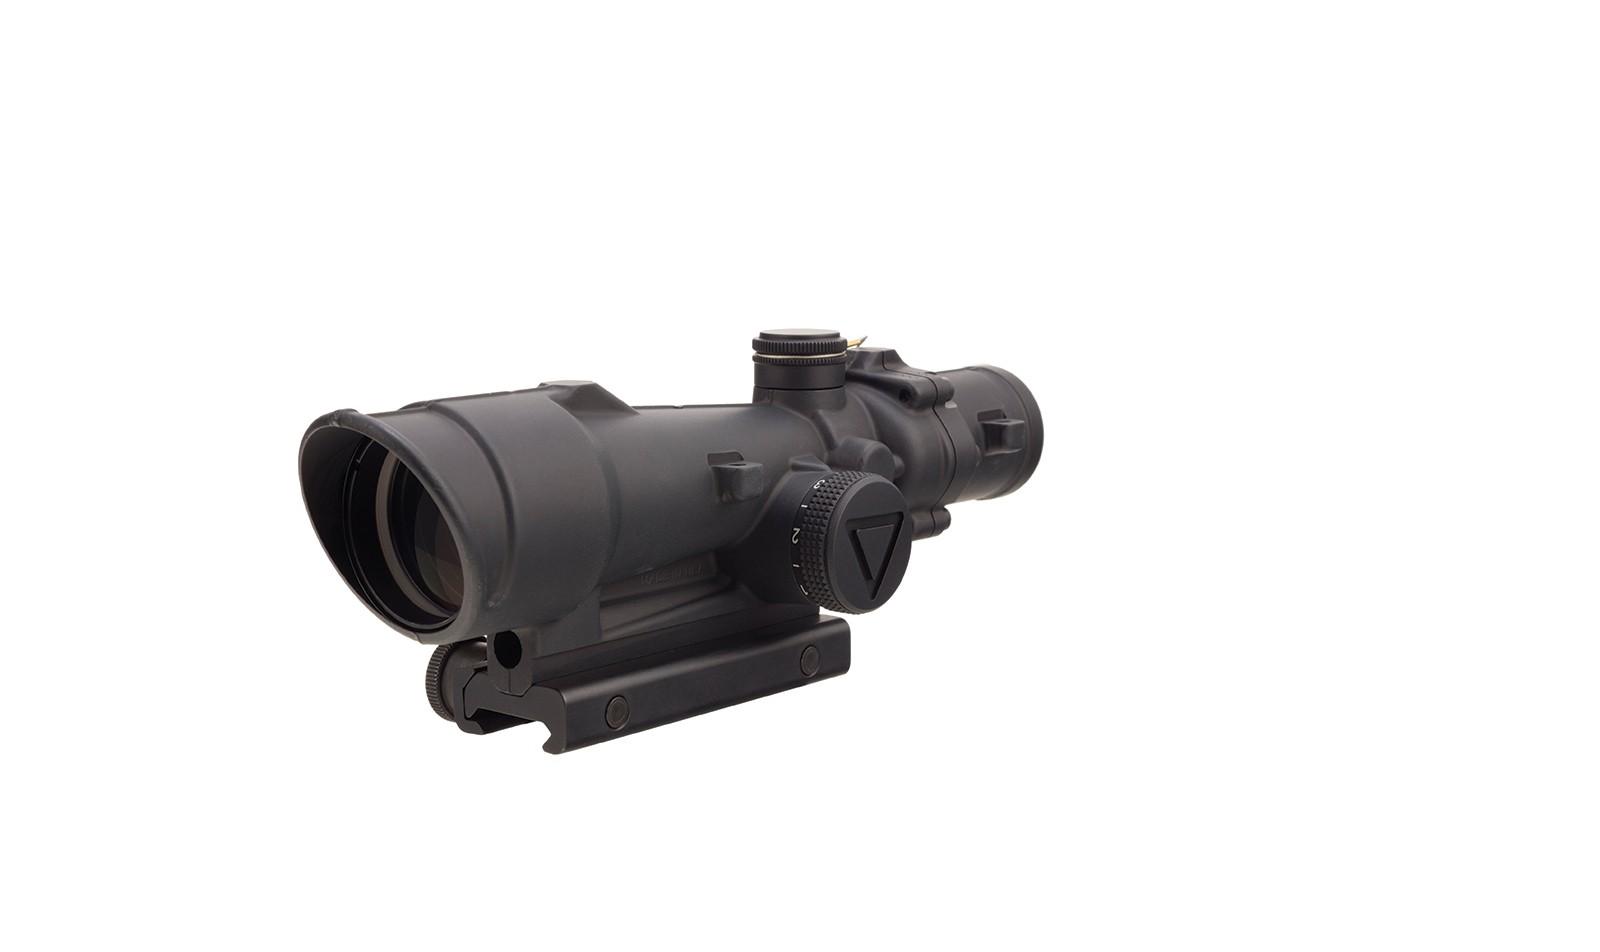 Trijicon ACOG® 3.5x35 LED Riflescope - .308 / 7.62 BDC